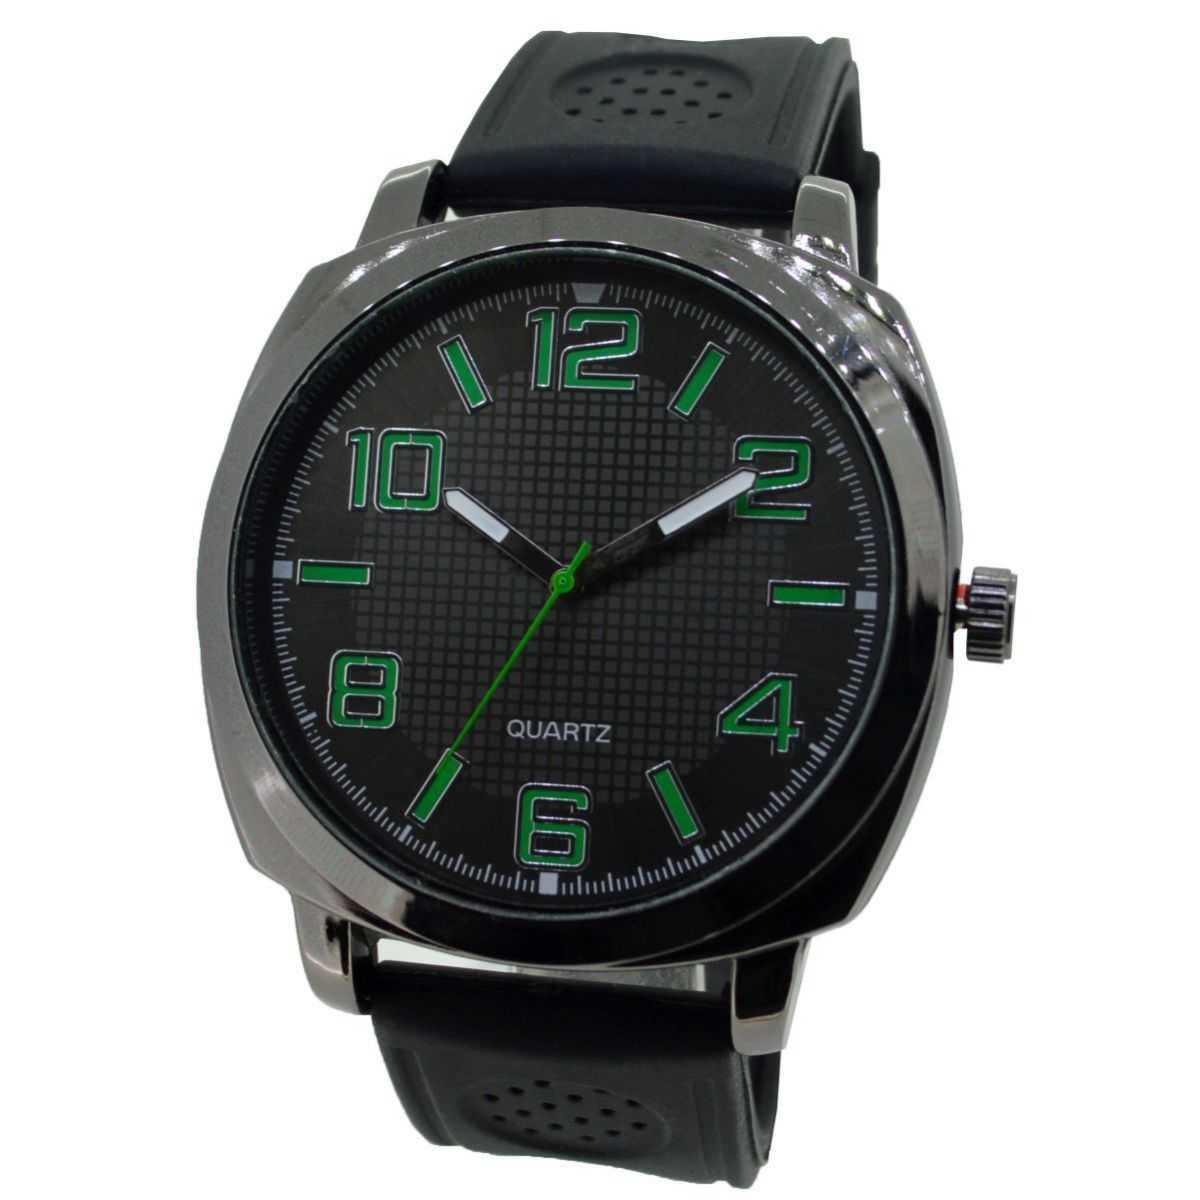 Relógio Personalizado 2464-7